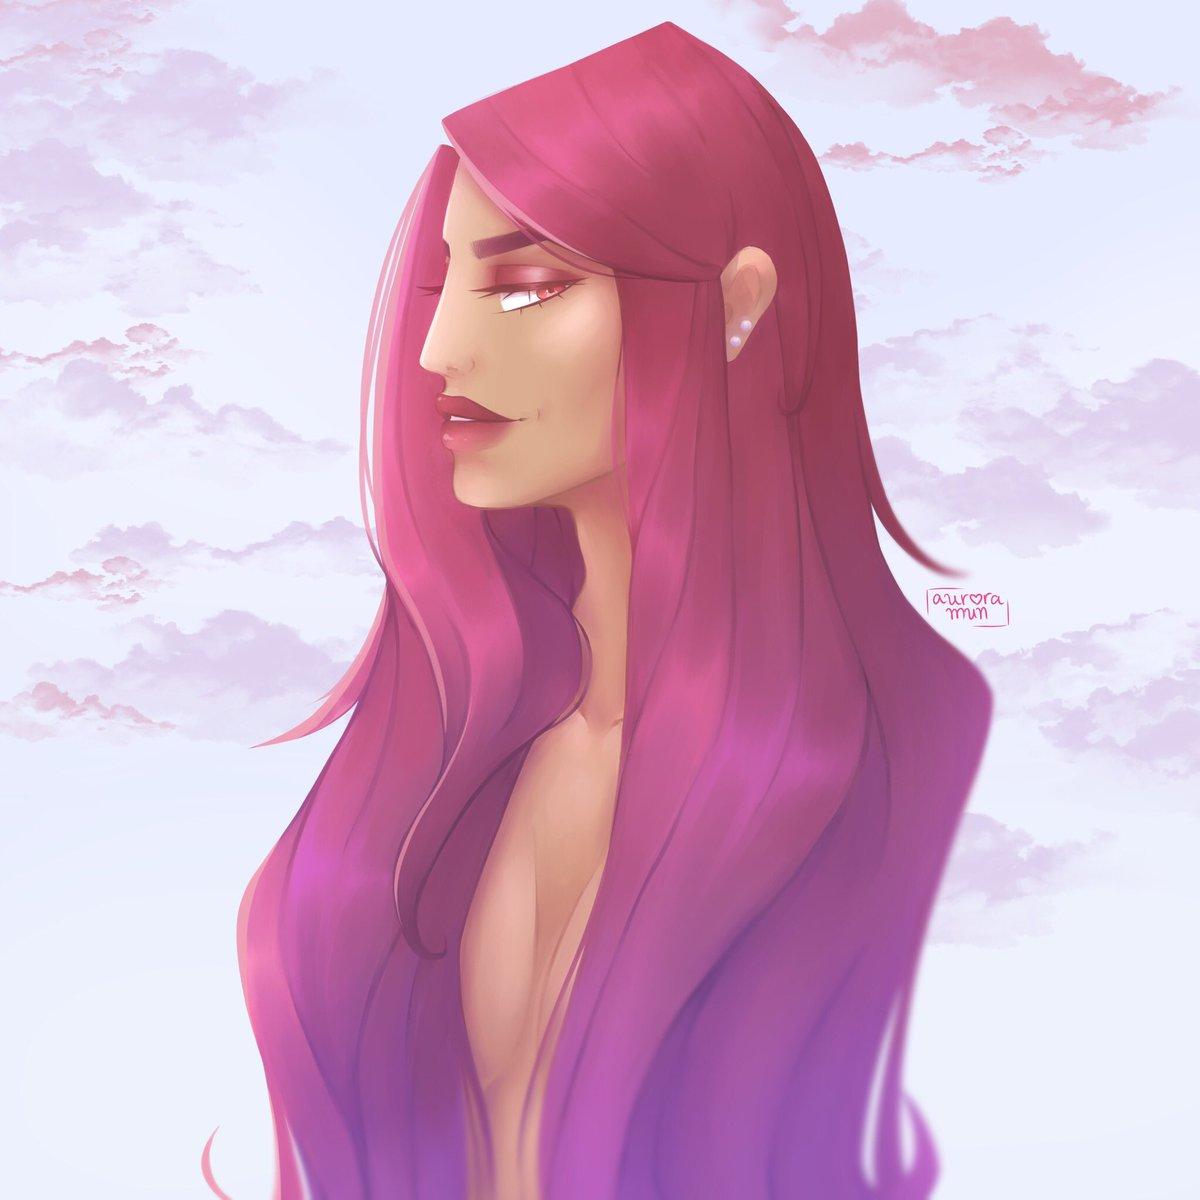 The Queen herself  #TheArcana #NadiaStarinava #NadiaTheArcana #NadiaFanart #TheArcanaFanart #Fanarts #illustration #artistsontwitterpic.twitter.com/YiLETwVhxB